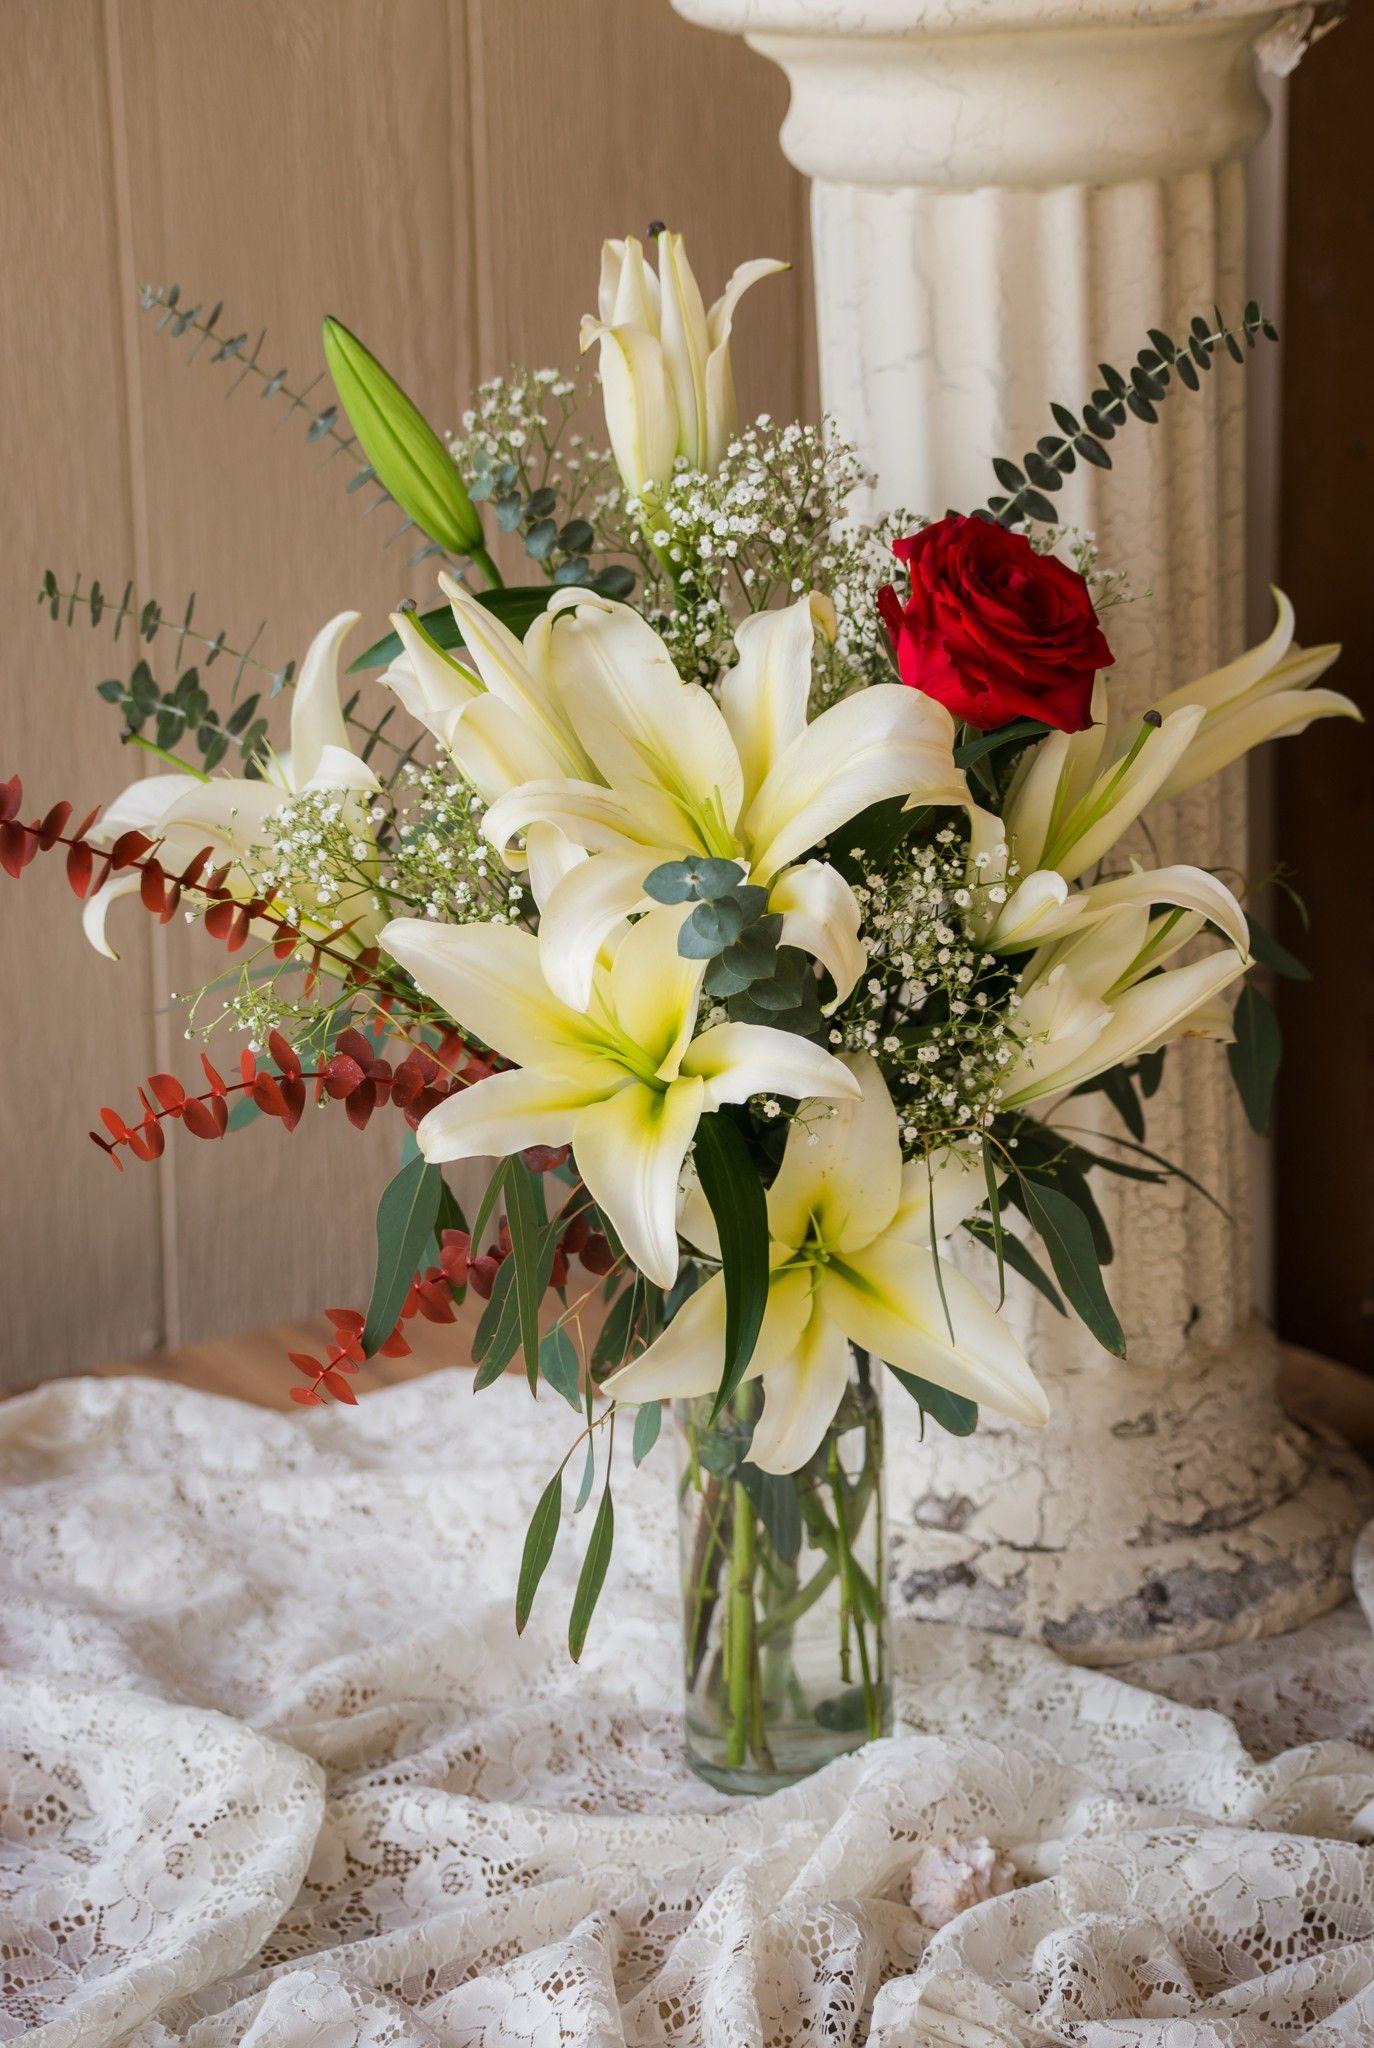 Enchanted Beauty Gardening Pinterest Fountain Design Flower